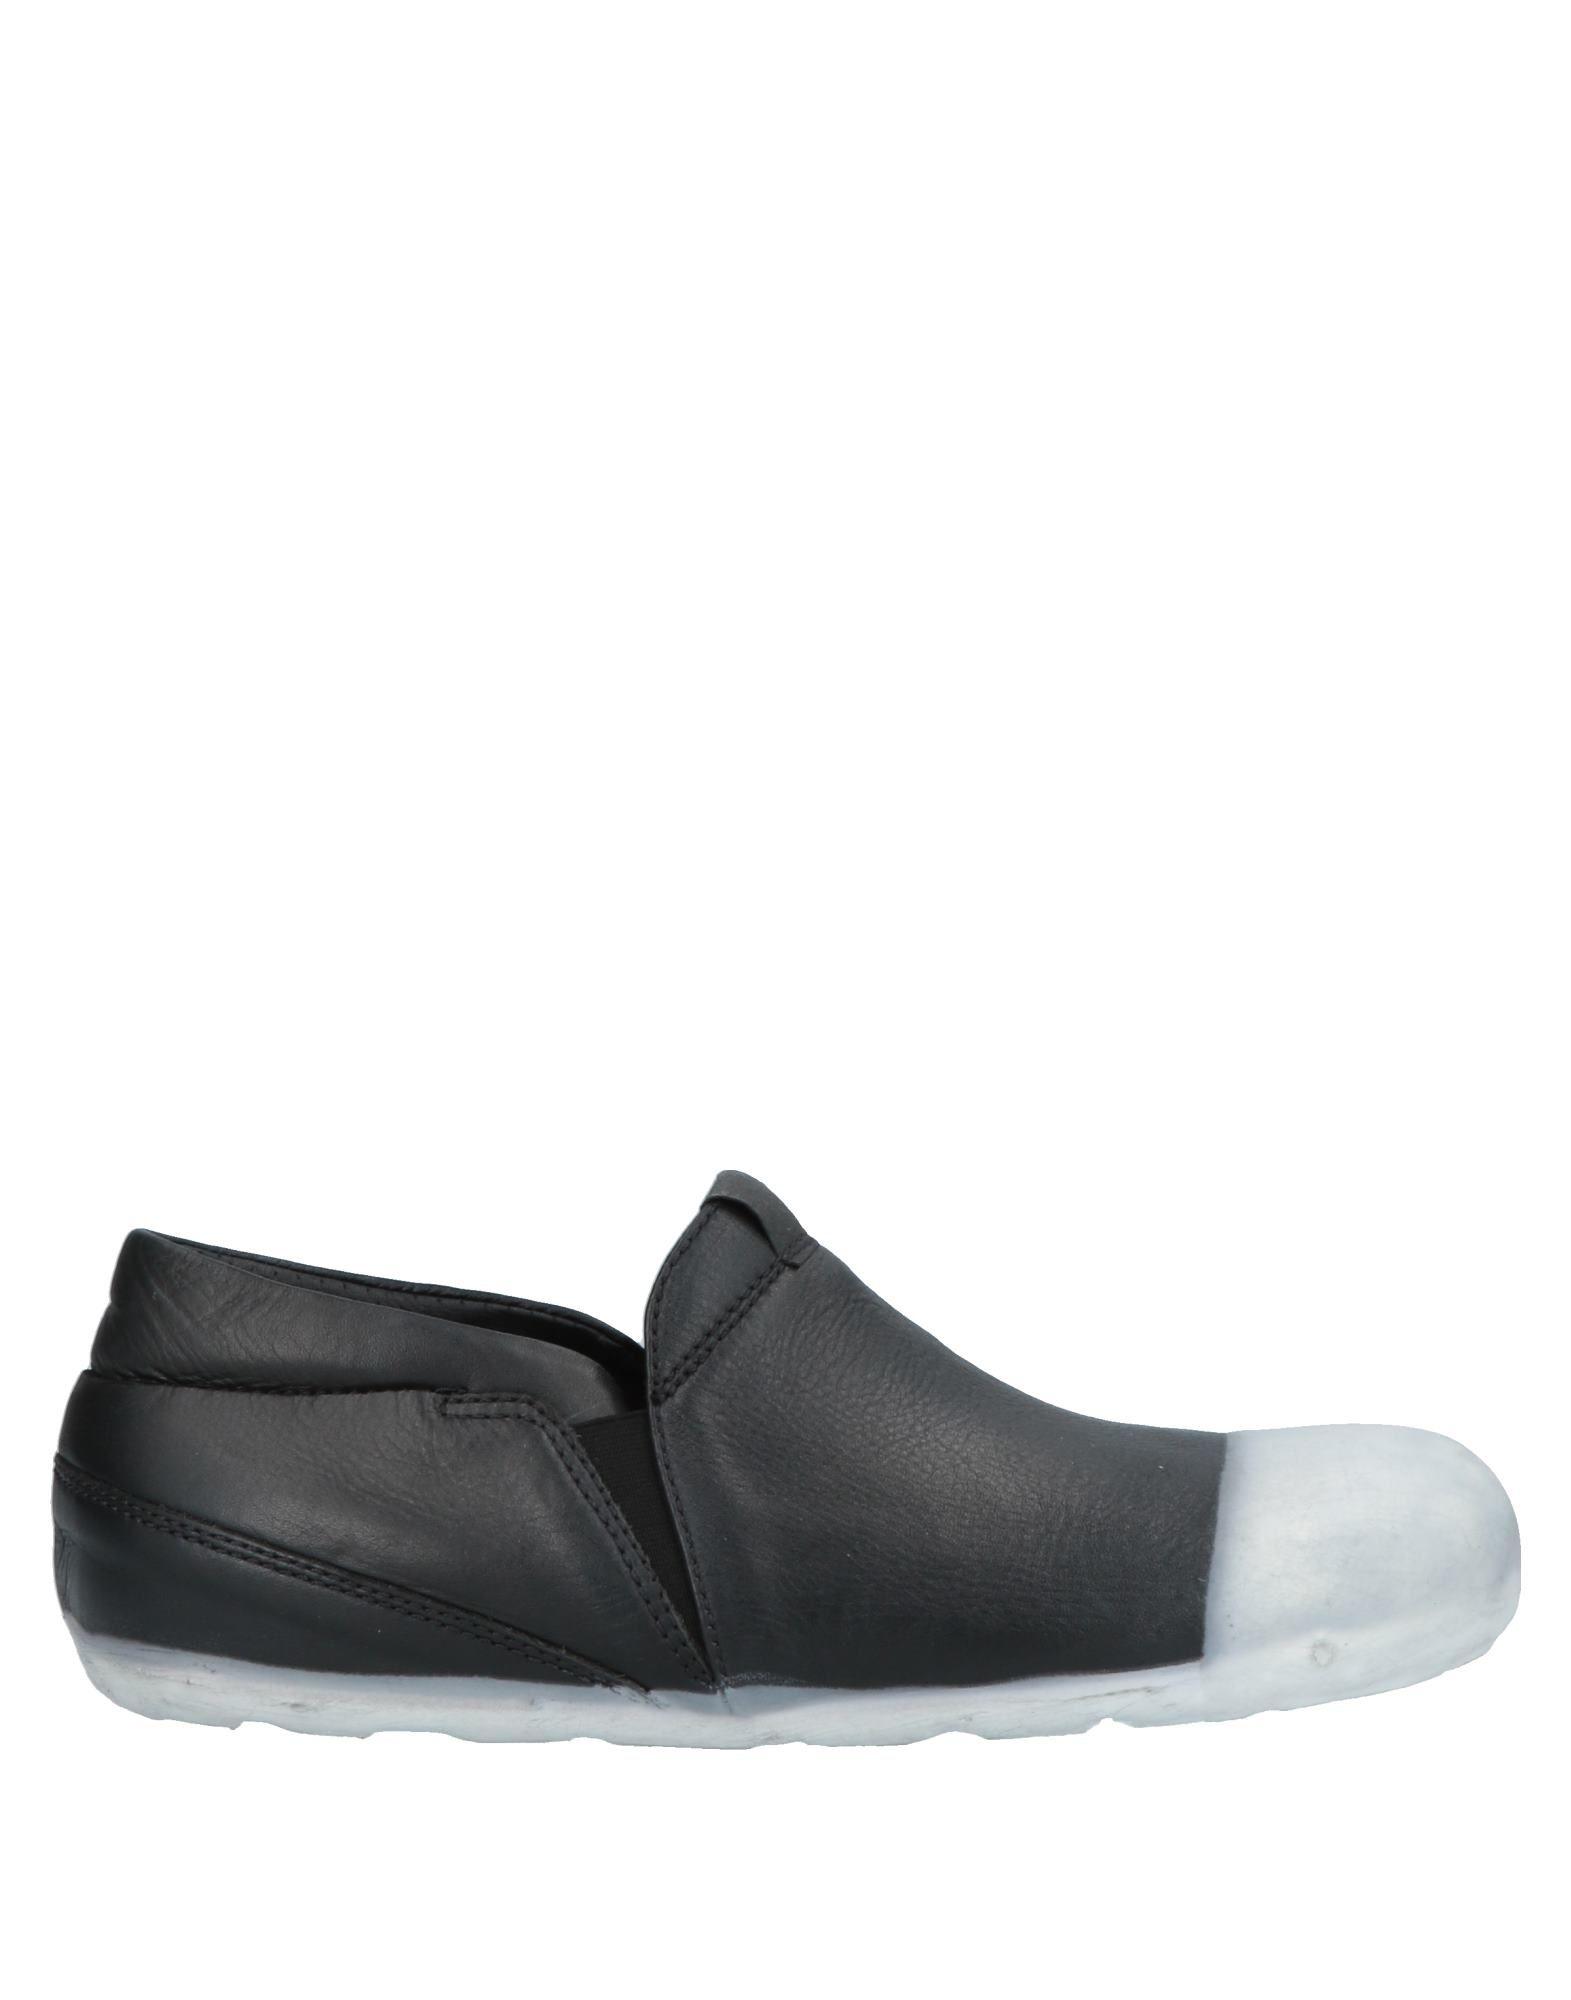 Negro Zapatillas O.X.S. Rubber Soul Mujer - Zapatillas O.X.S. O.X.S. O.X.S. Rubber Soul Recortes de precios estacionales, beneficios de descuento e7b8c1